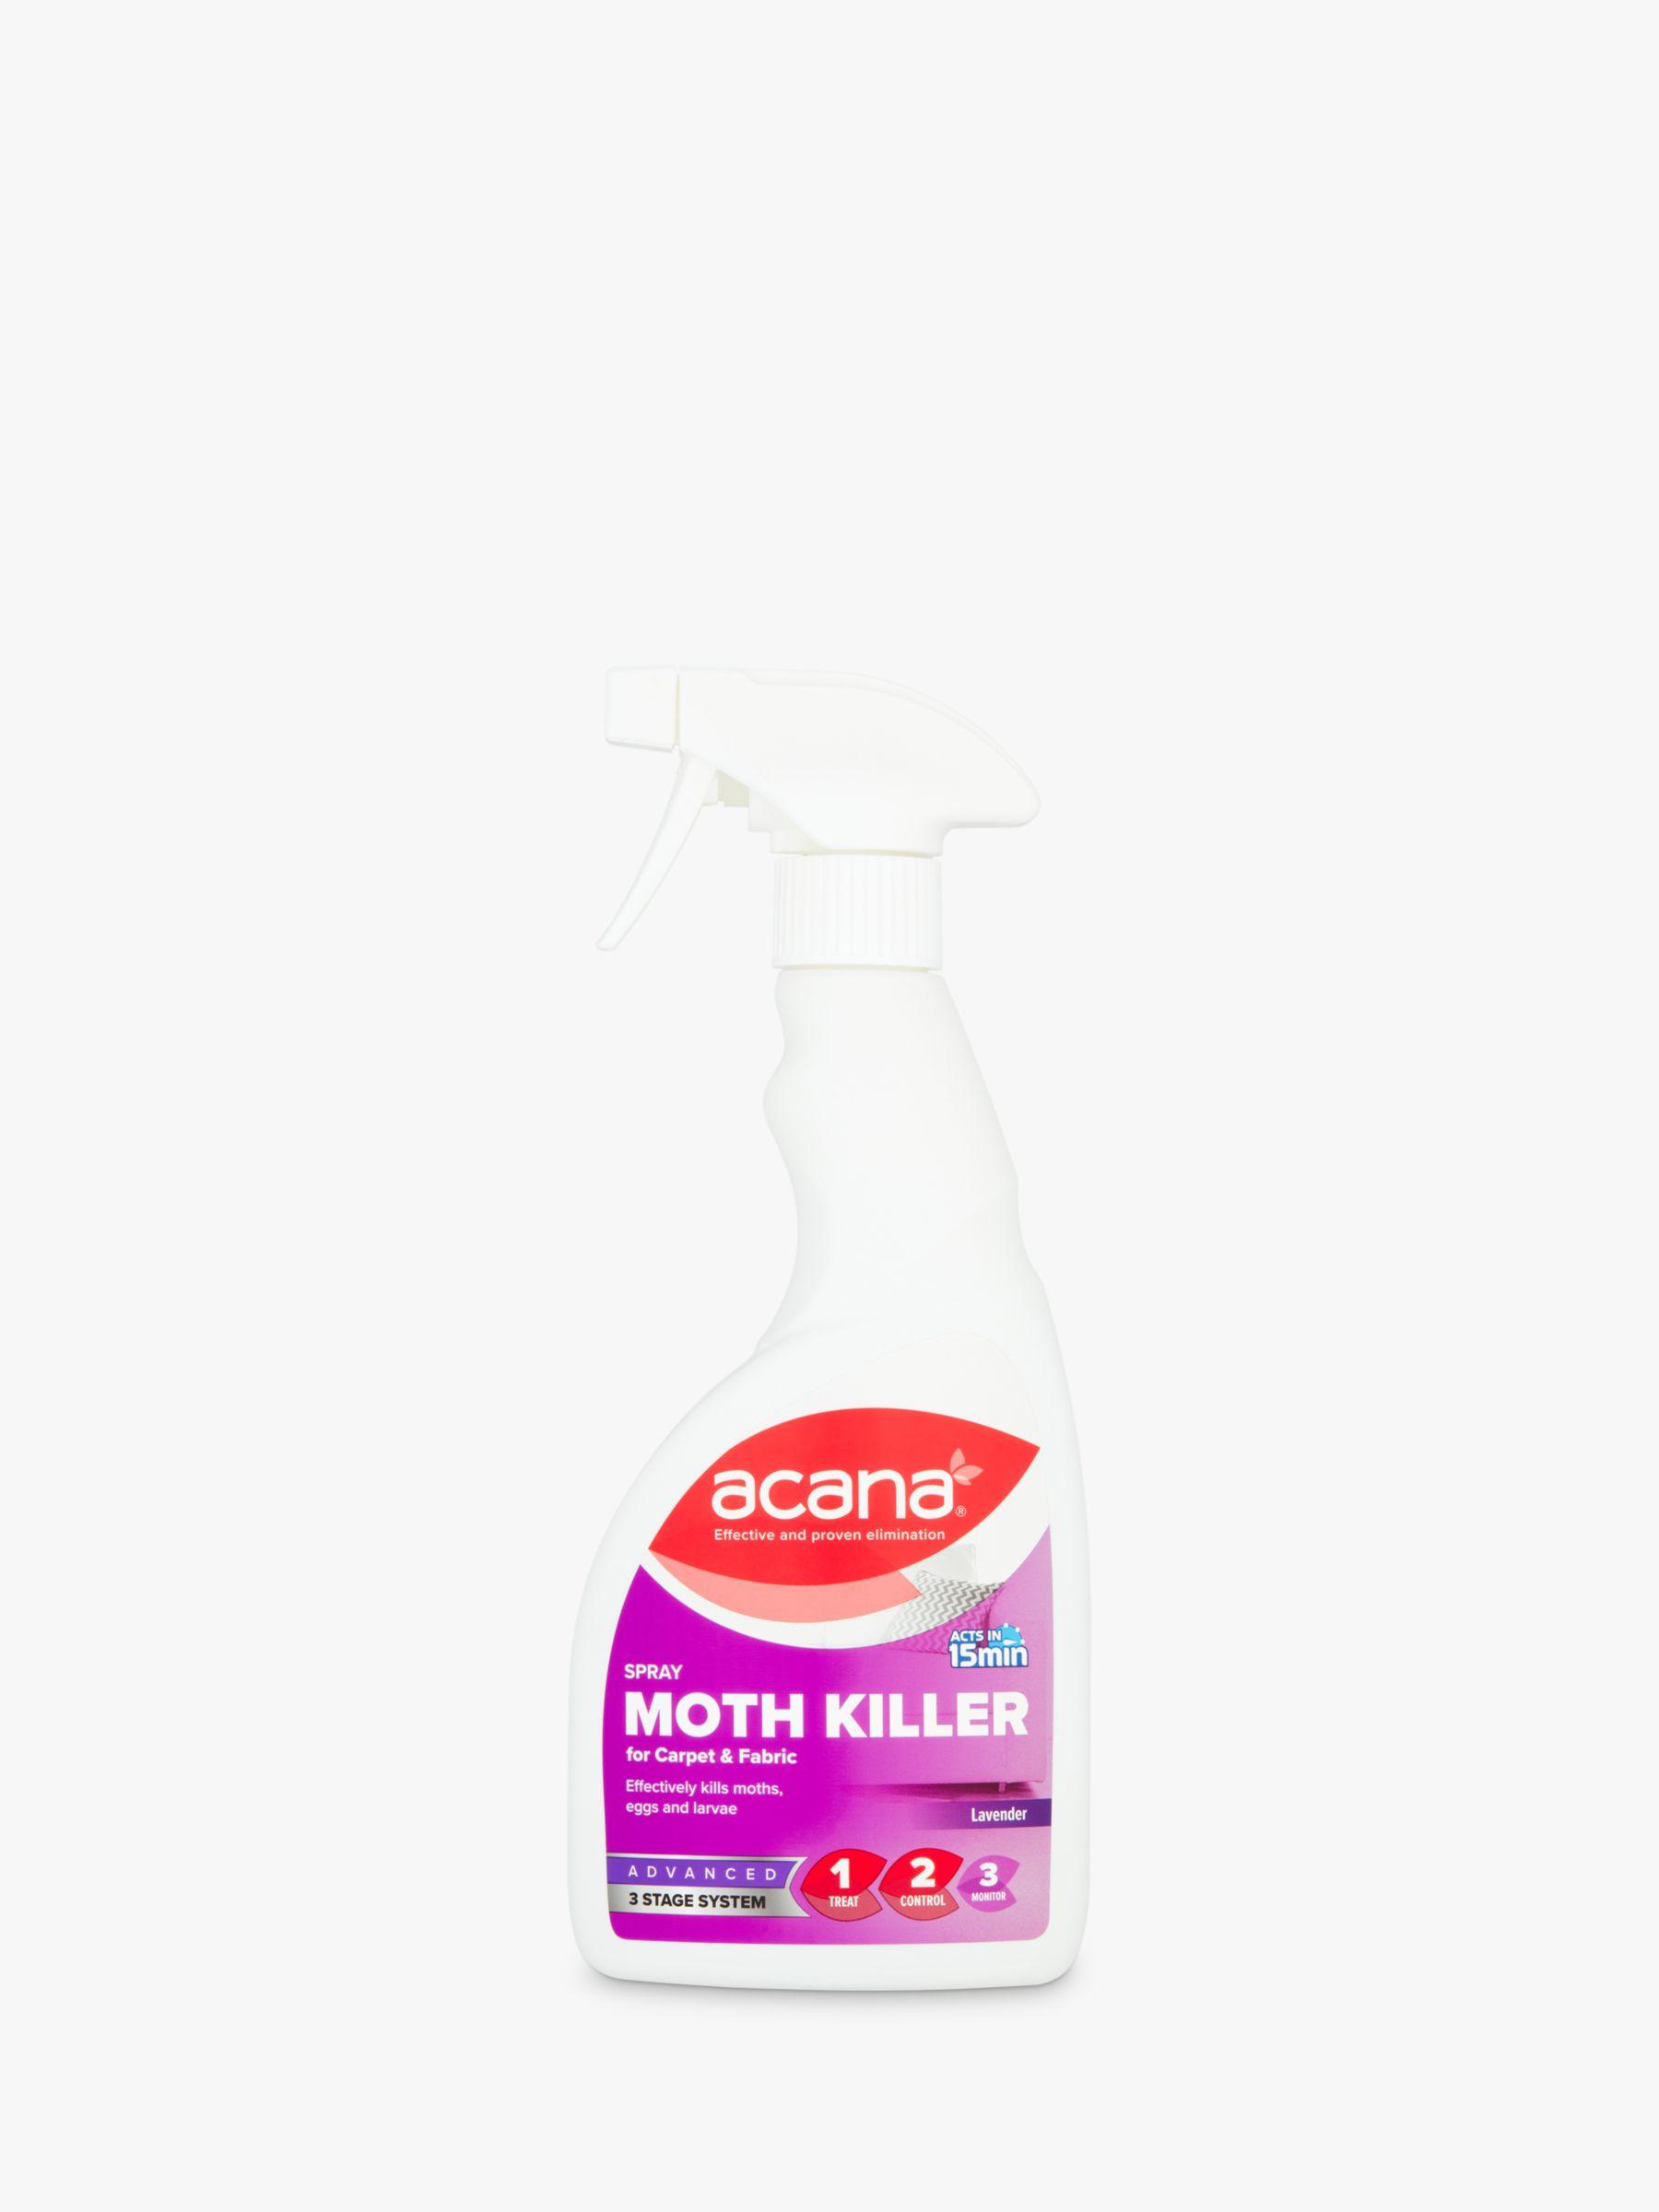 Acana Acana Fabric Moth Killer / Freshener Spray, 500ml